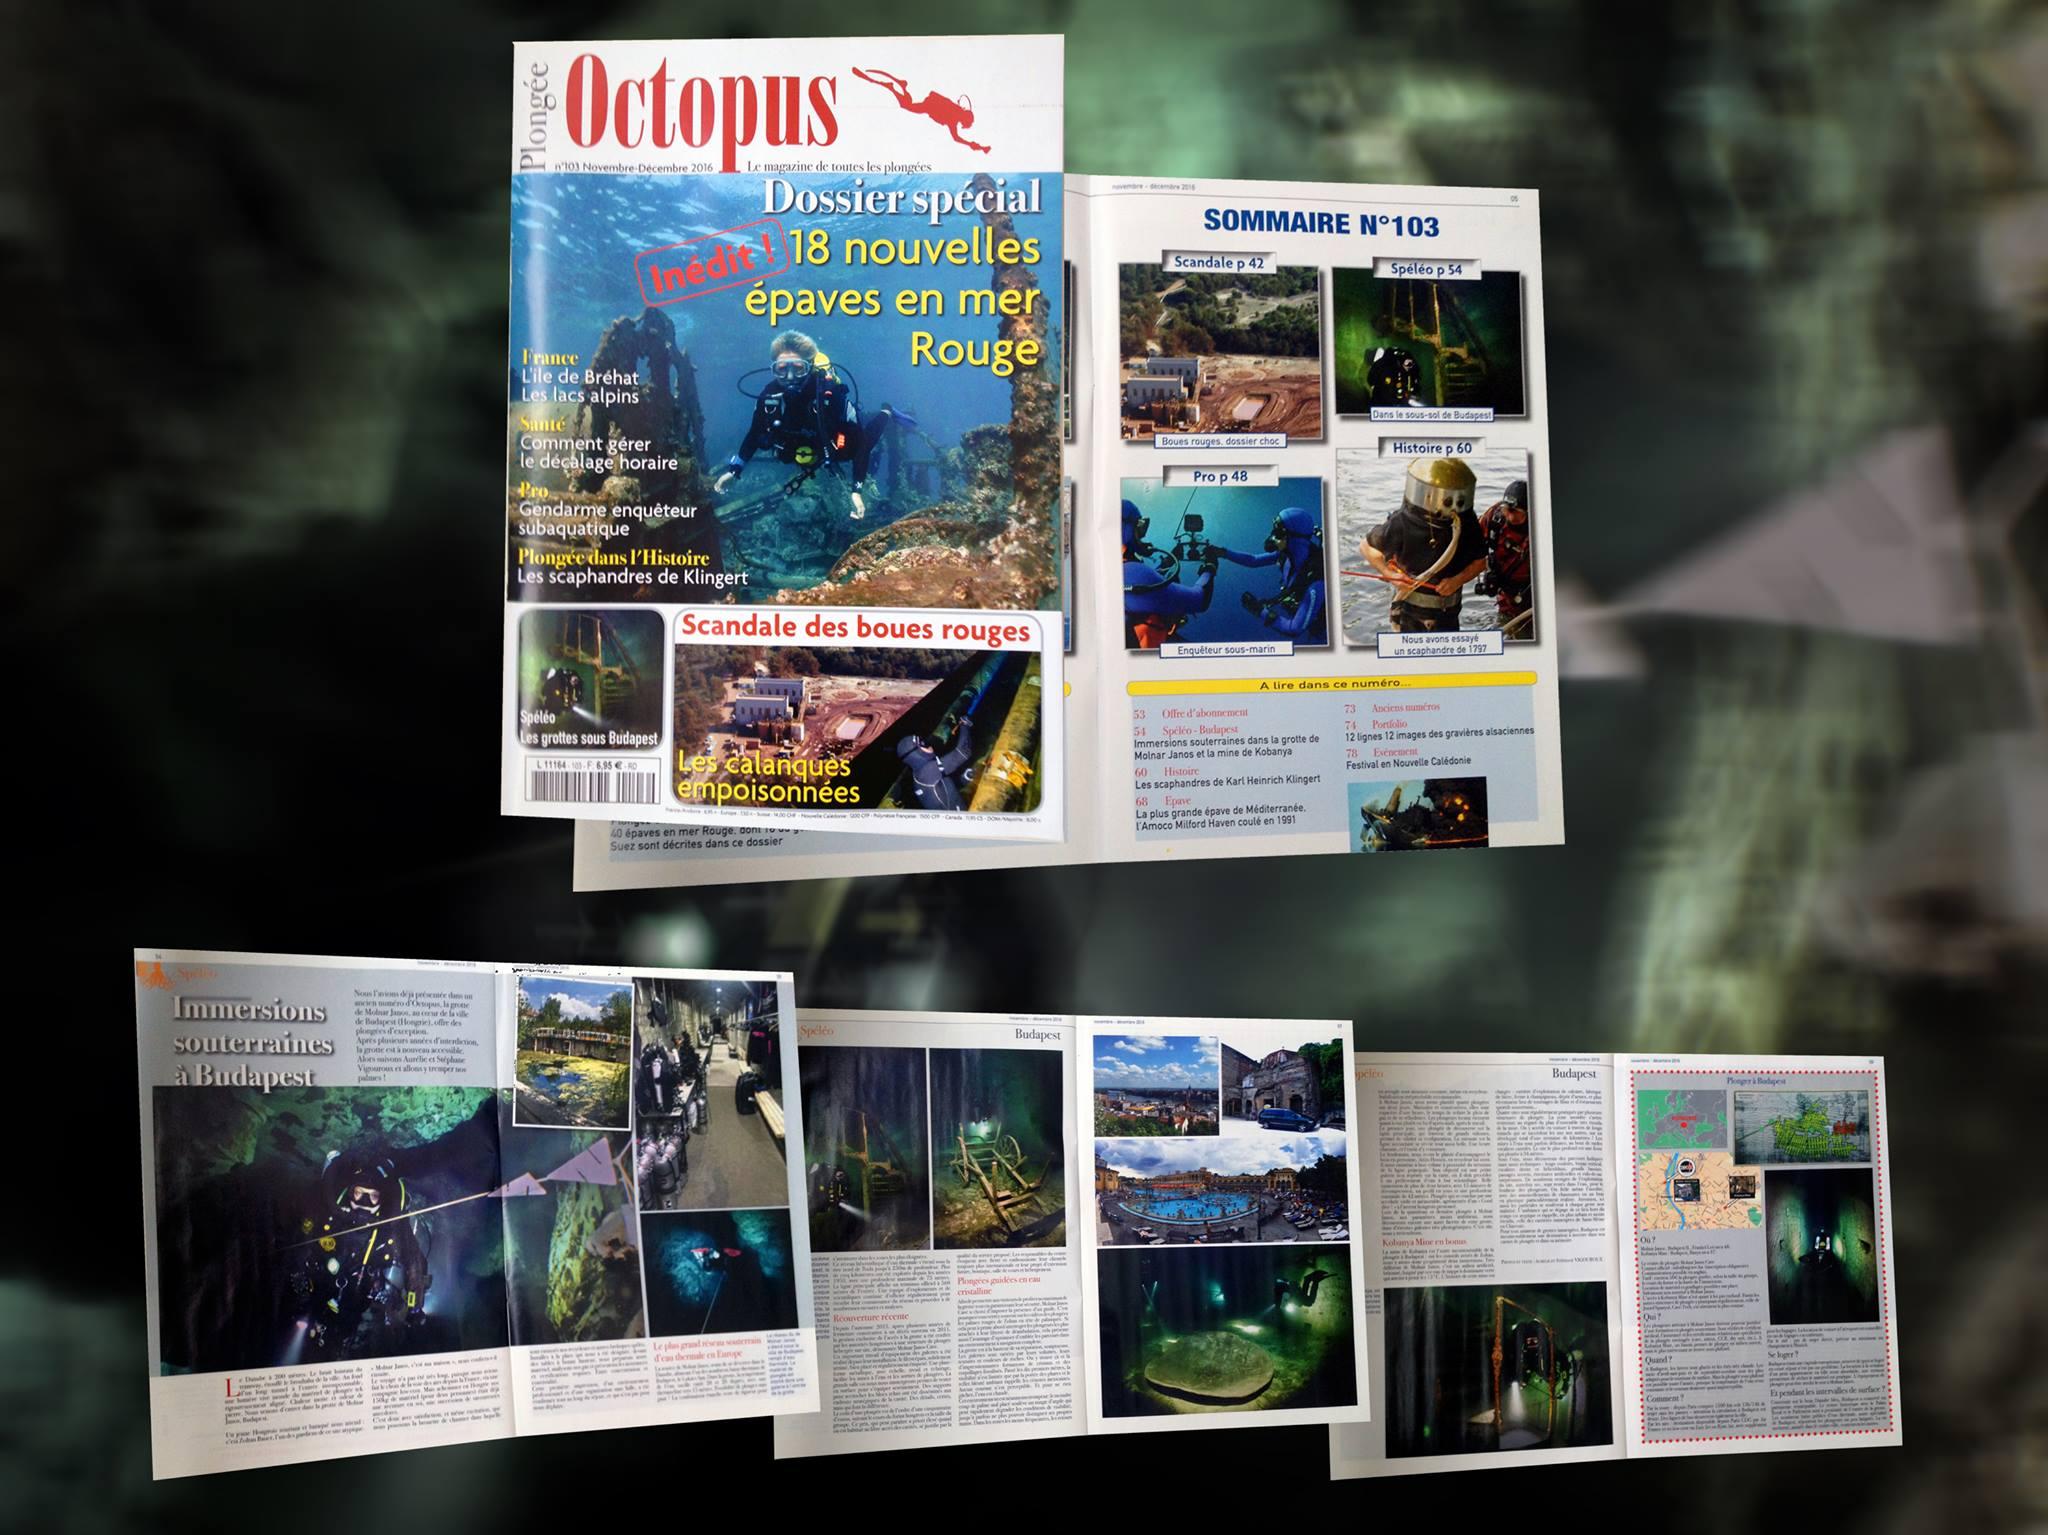 Octopus #103